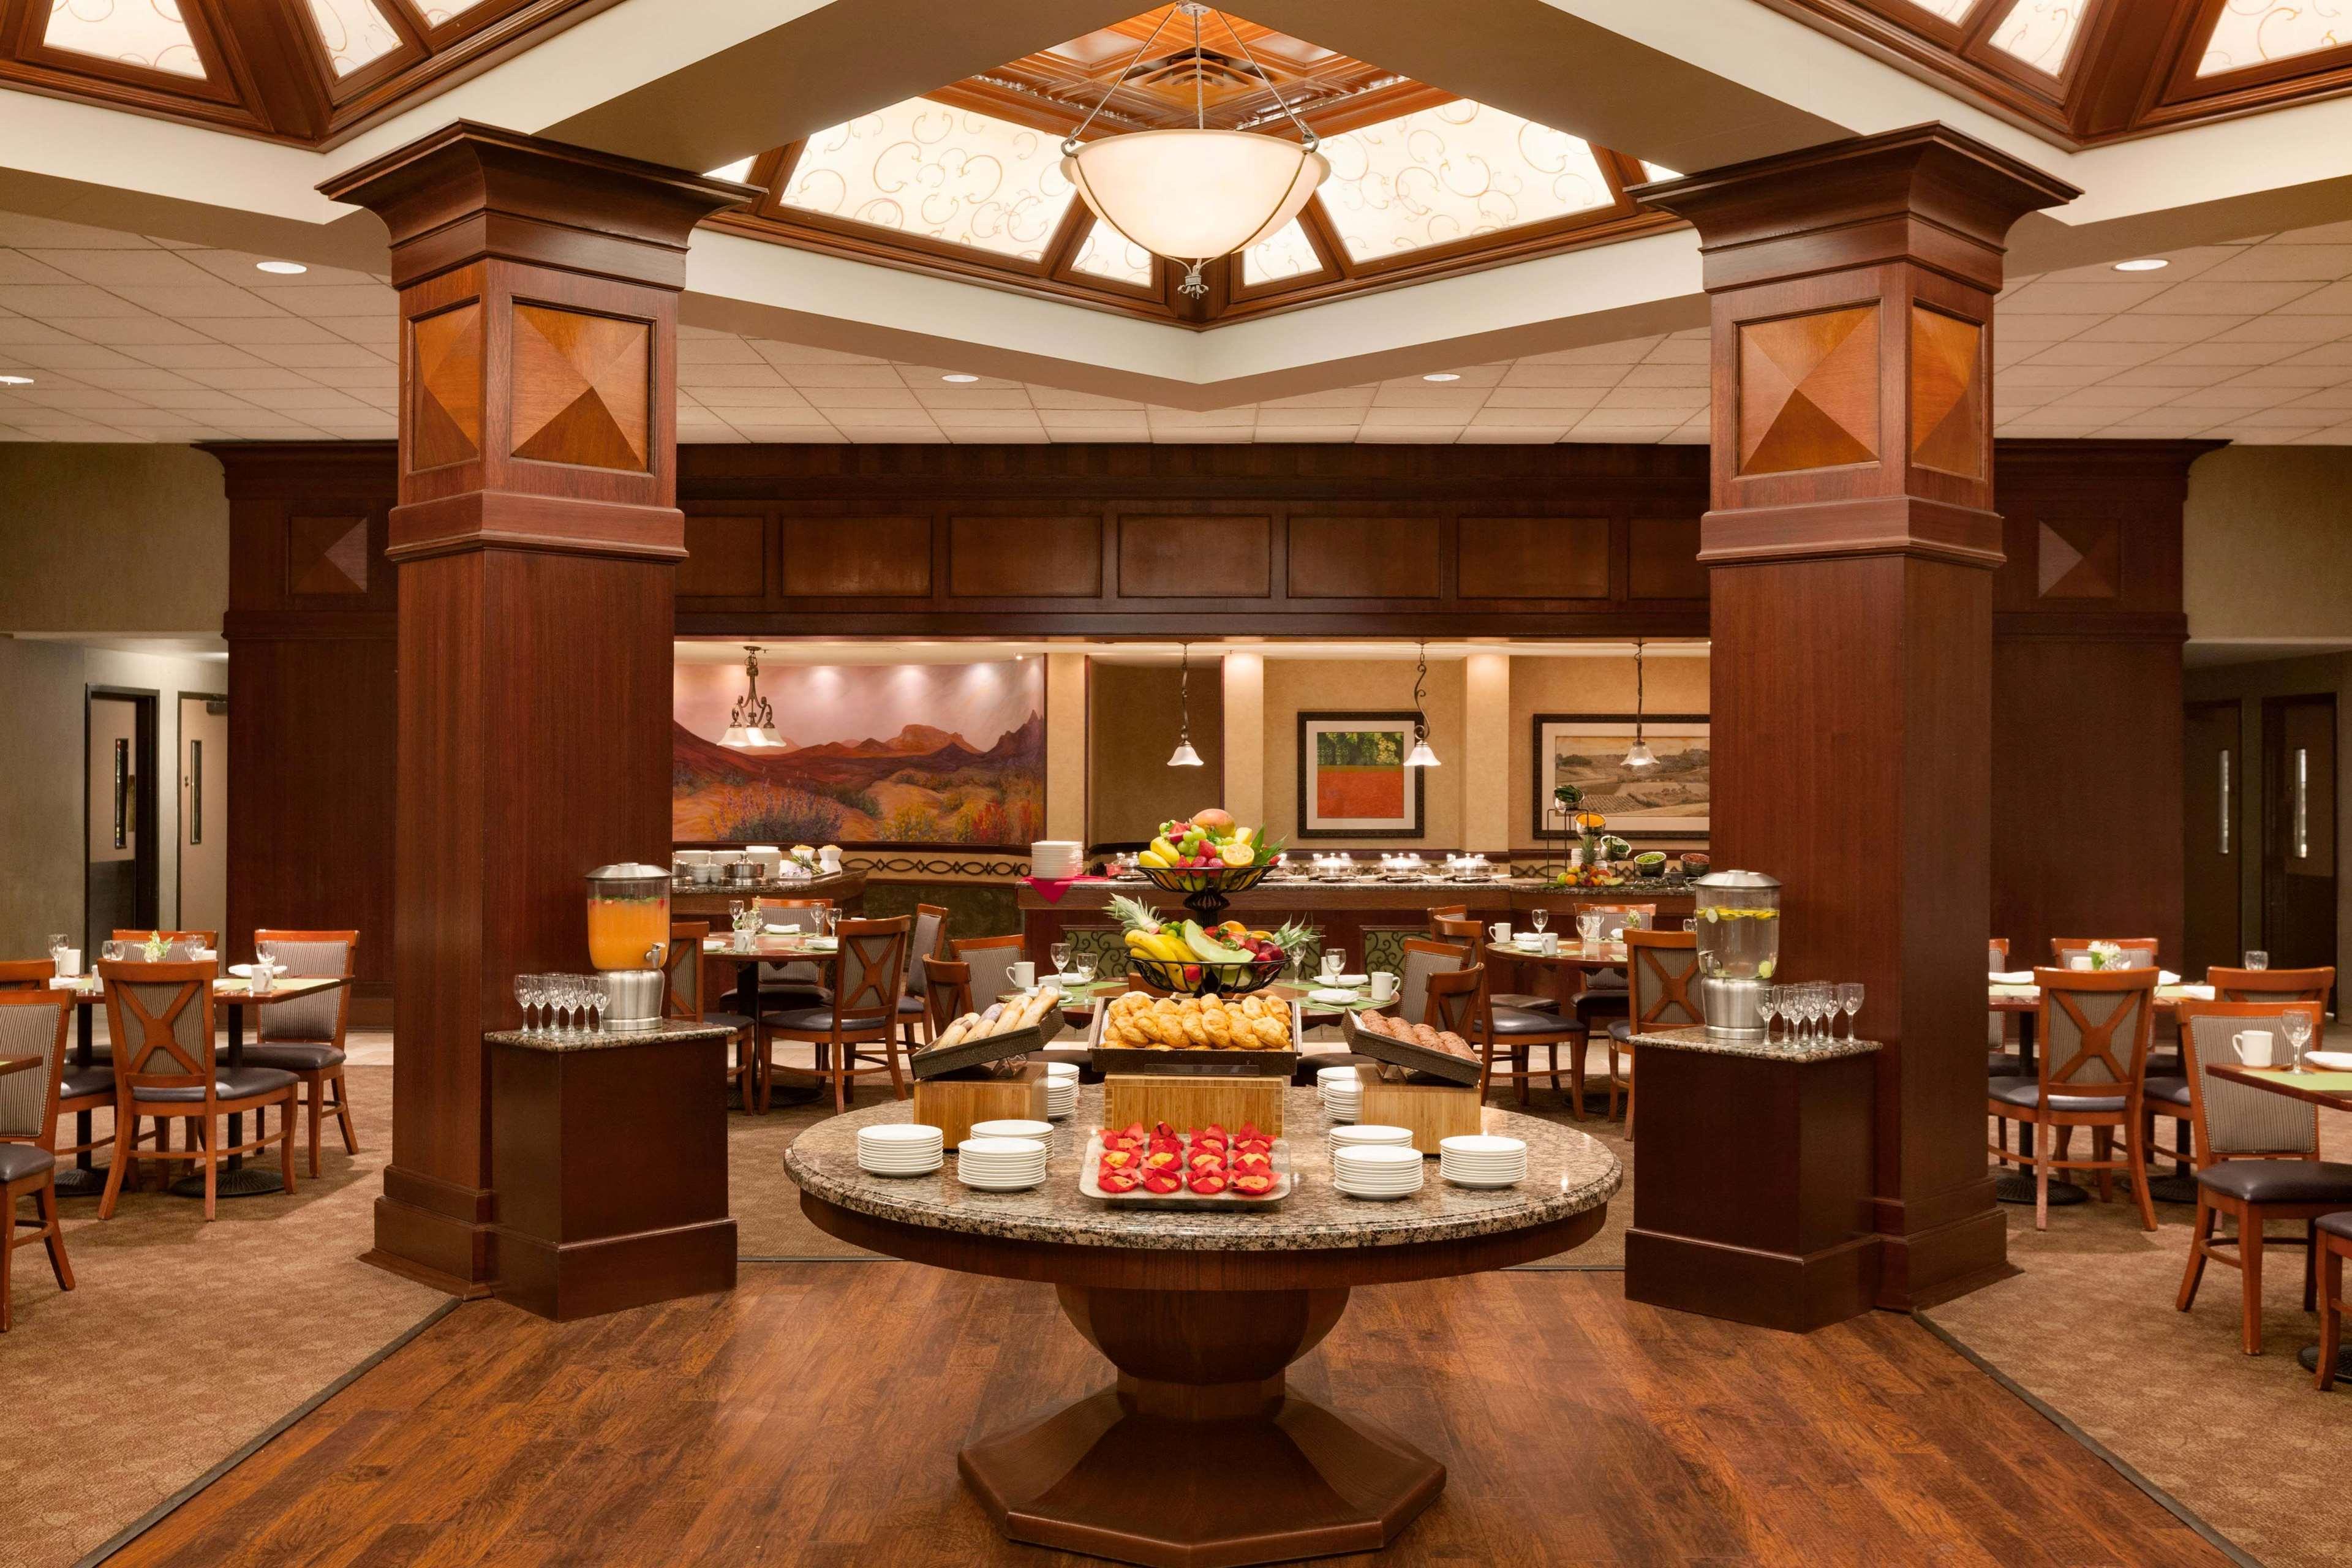 Hilton DFW Lakes Executive Conference Center image 38